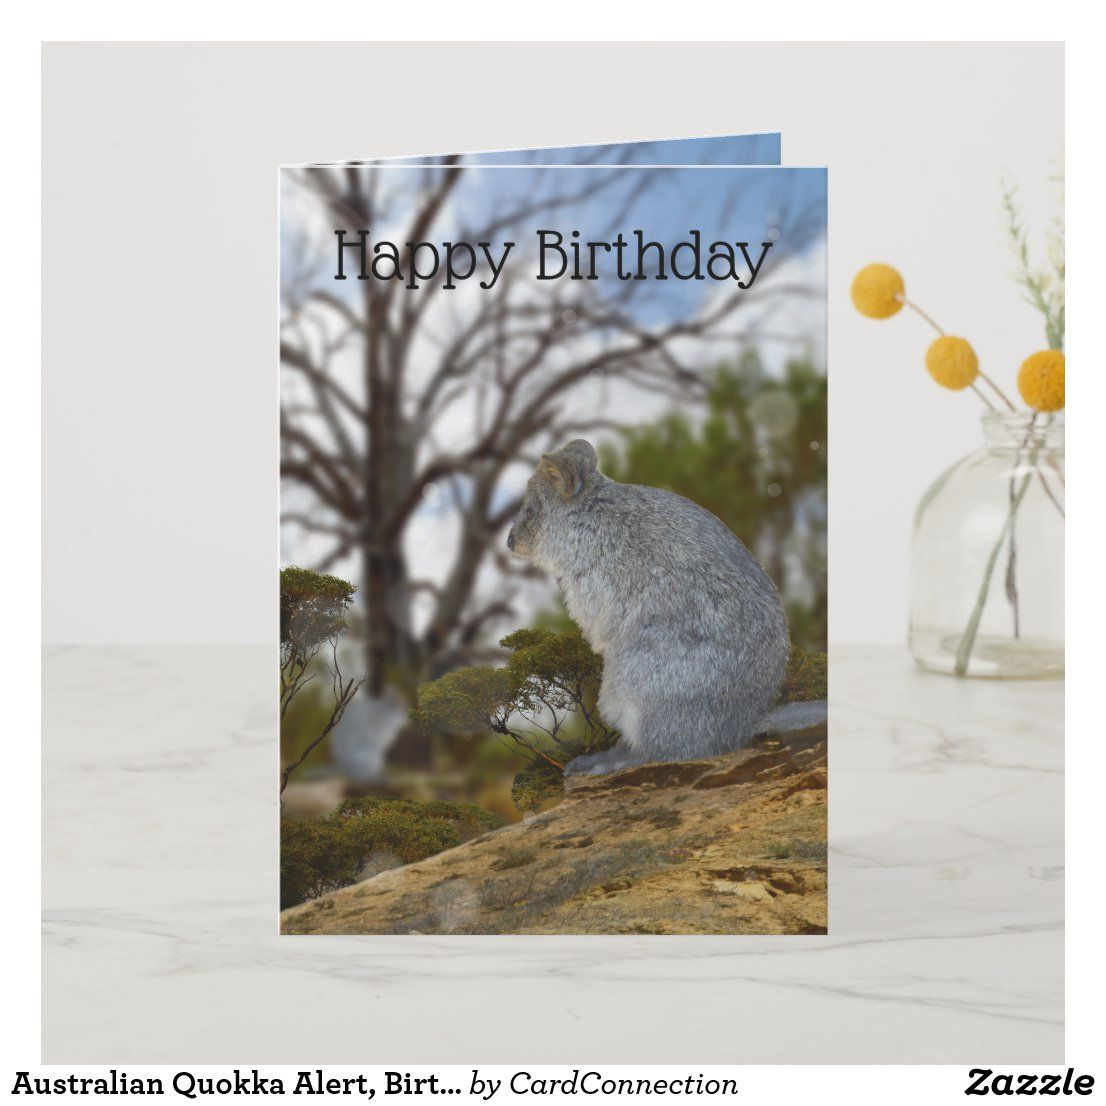 Australian Quokka Alert Birthday Card Card Zazzle Com Au Birthday Cards Cards Birthday